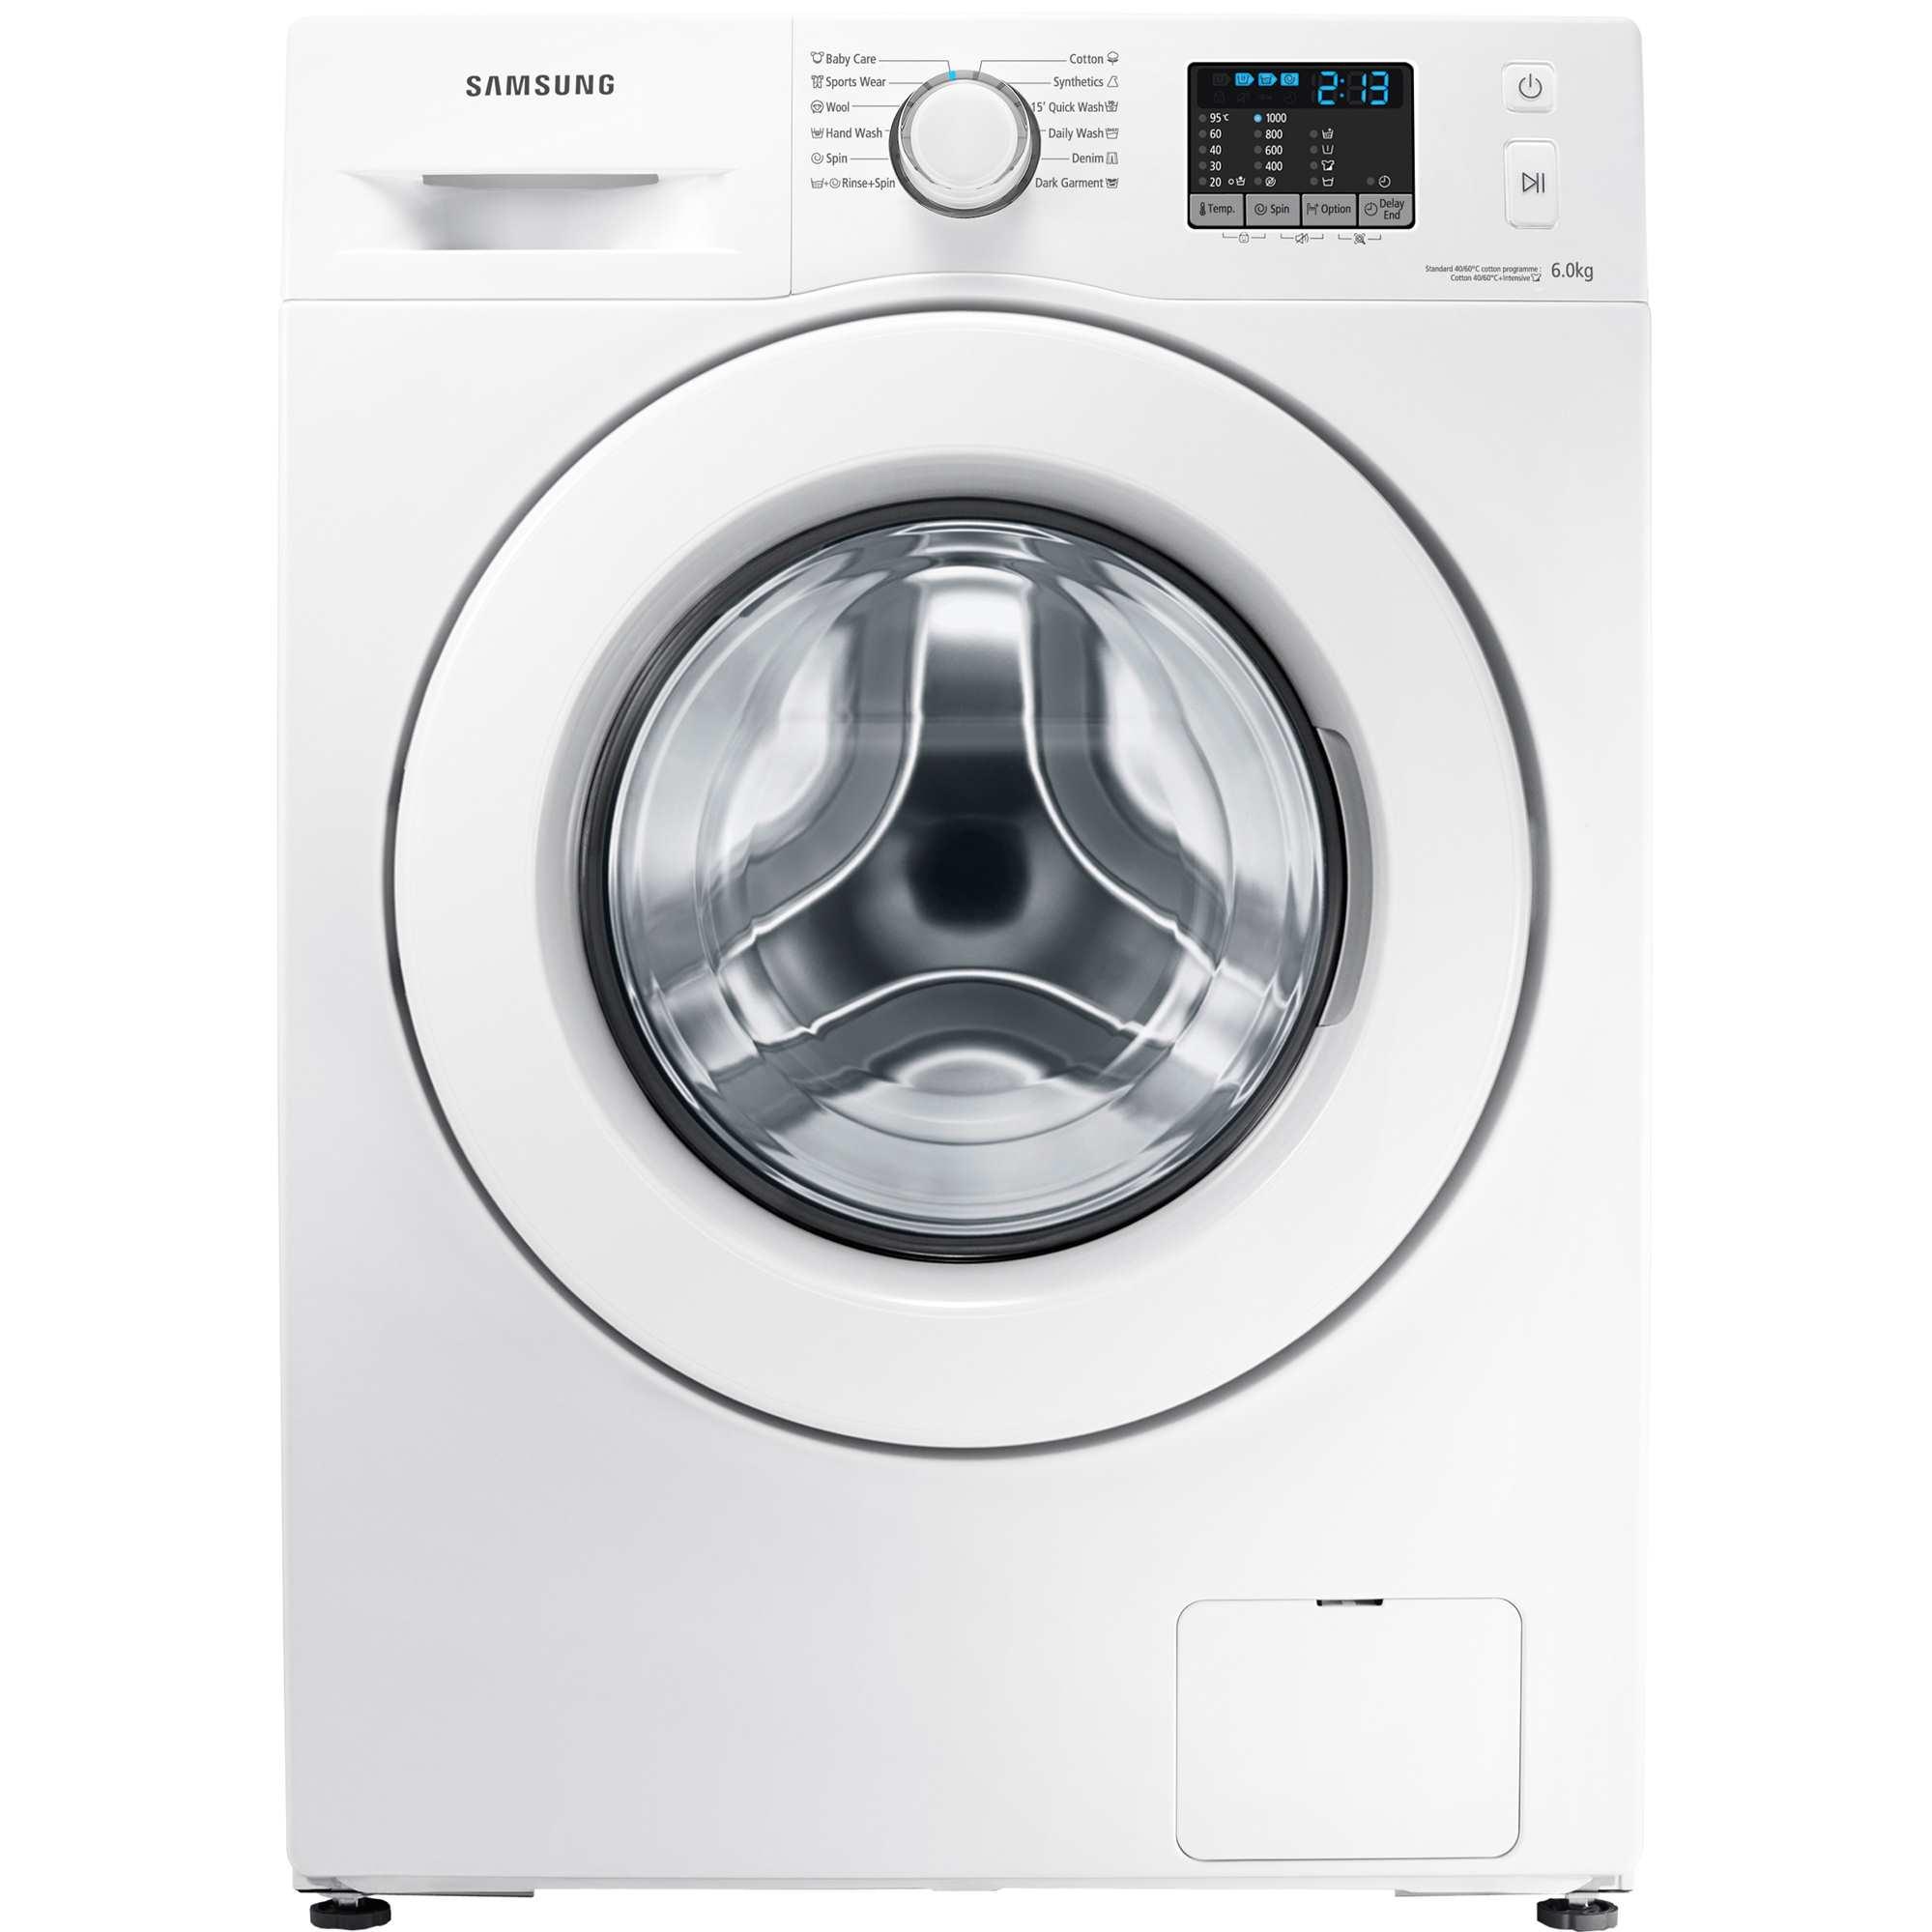 Masina de spalat rufe Slim Samsung WF60F4E0N0W